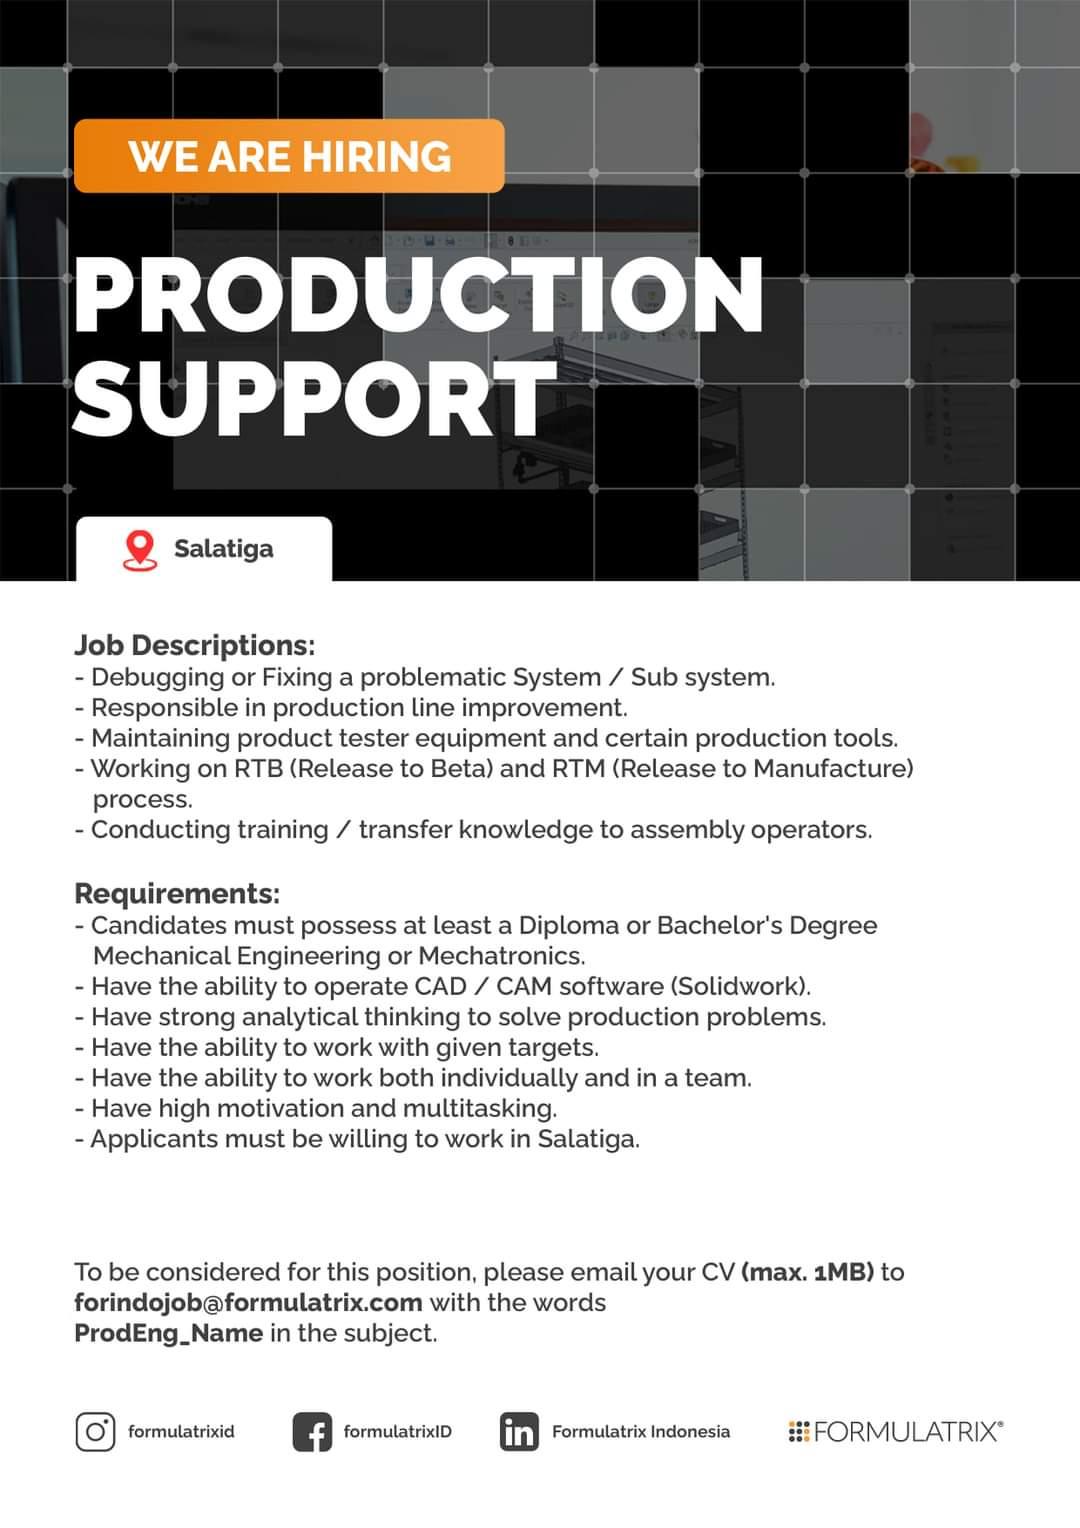 Lowongan Salatiga Formulatrix Indonesia Untuk Posisi Production Support, Elecrtonic Assy Operator & Injection Operator